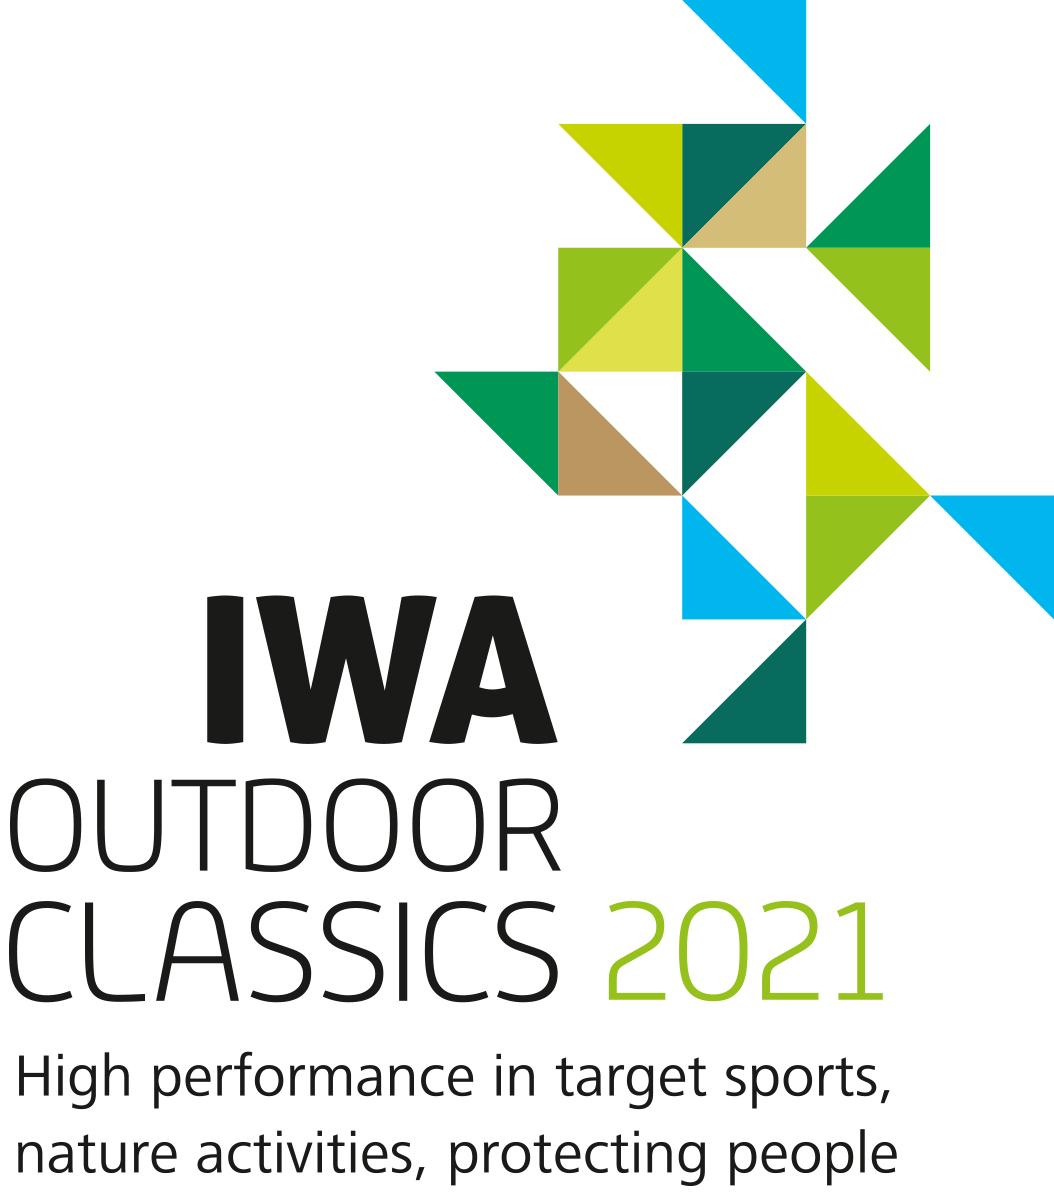 IWA-2021-Logo-Kombination-RGB-300dpi